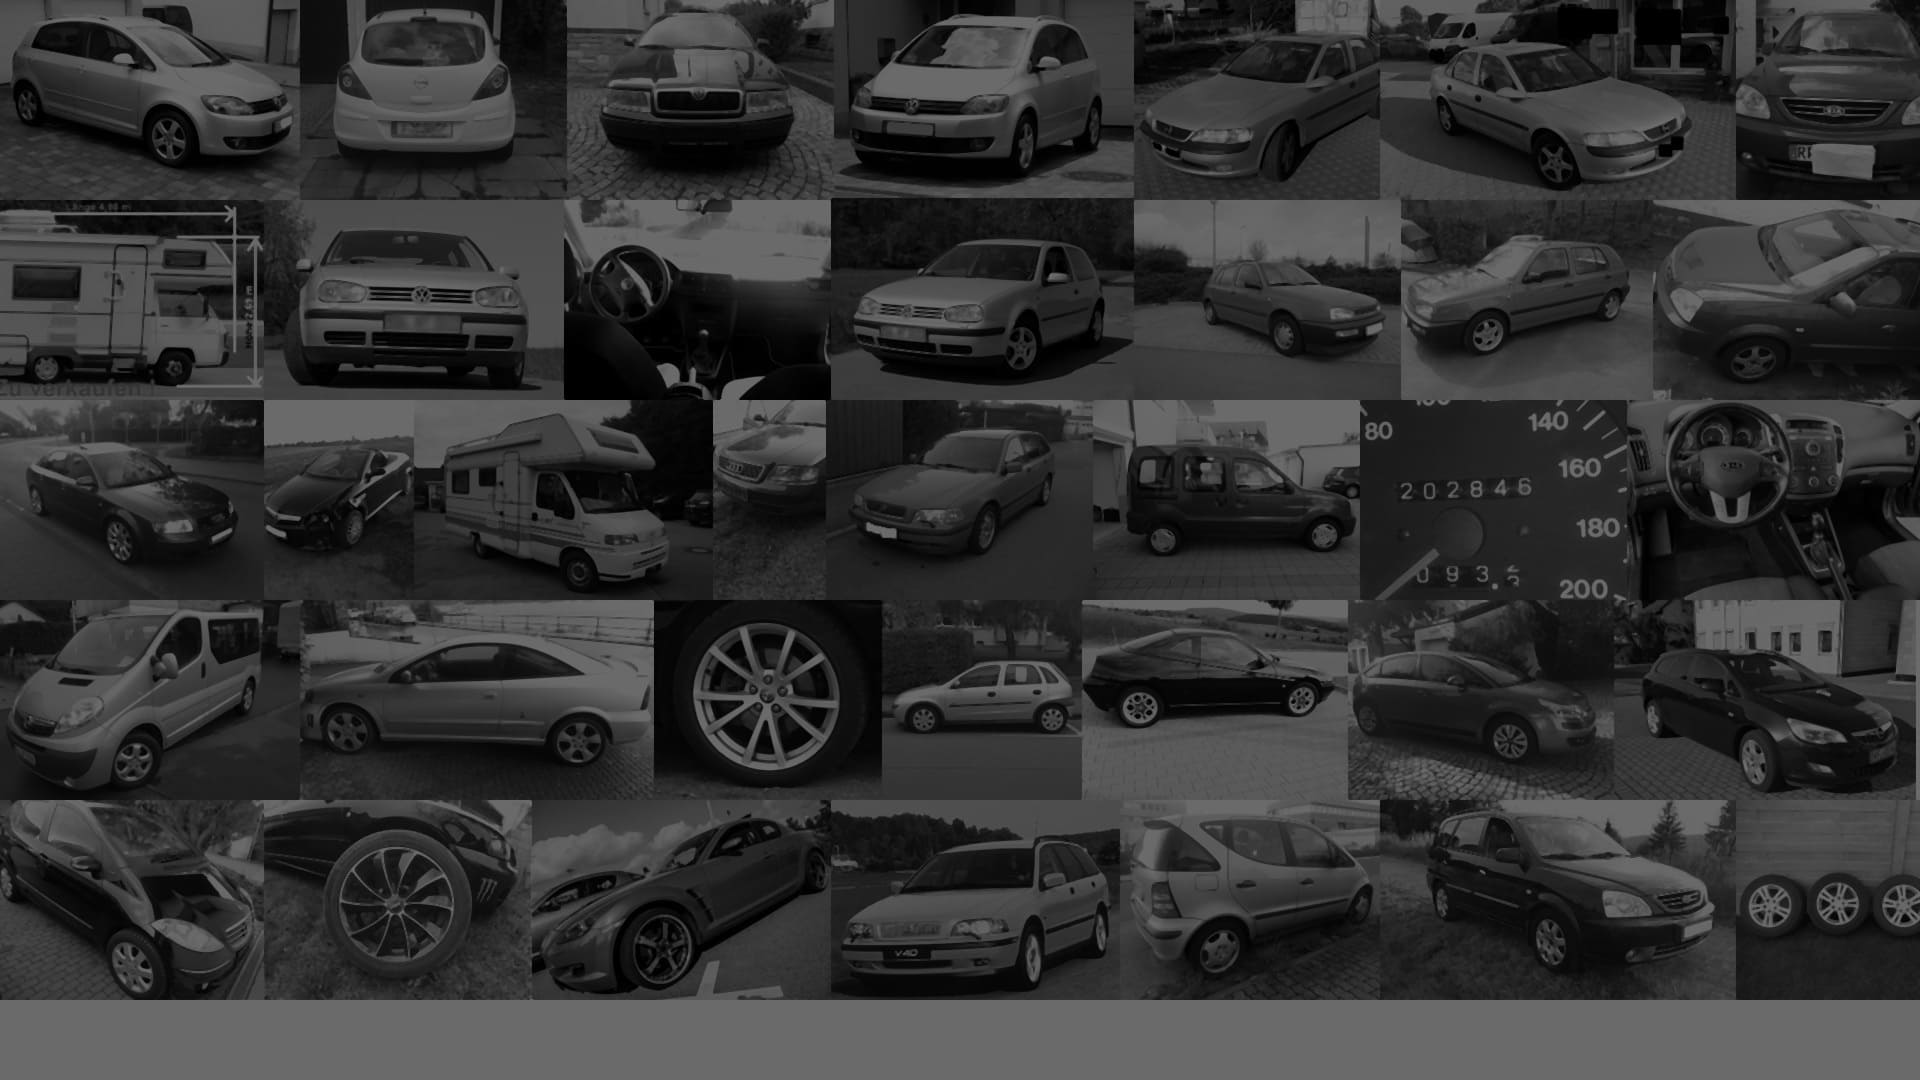 auto verkaufen bei autoankauf export auto ankauf 56. Black Bedroom Furniture Sets. Home Design Ideas